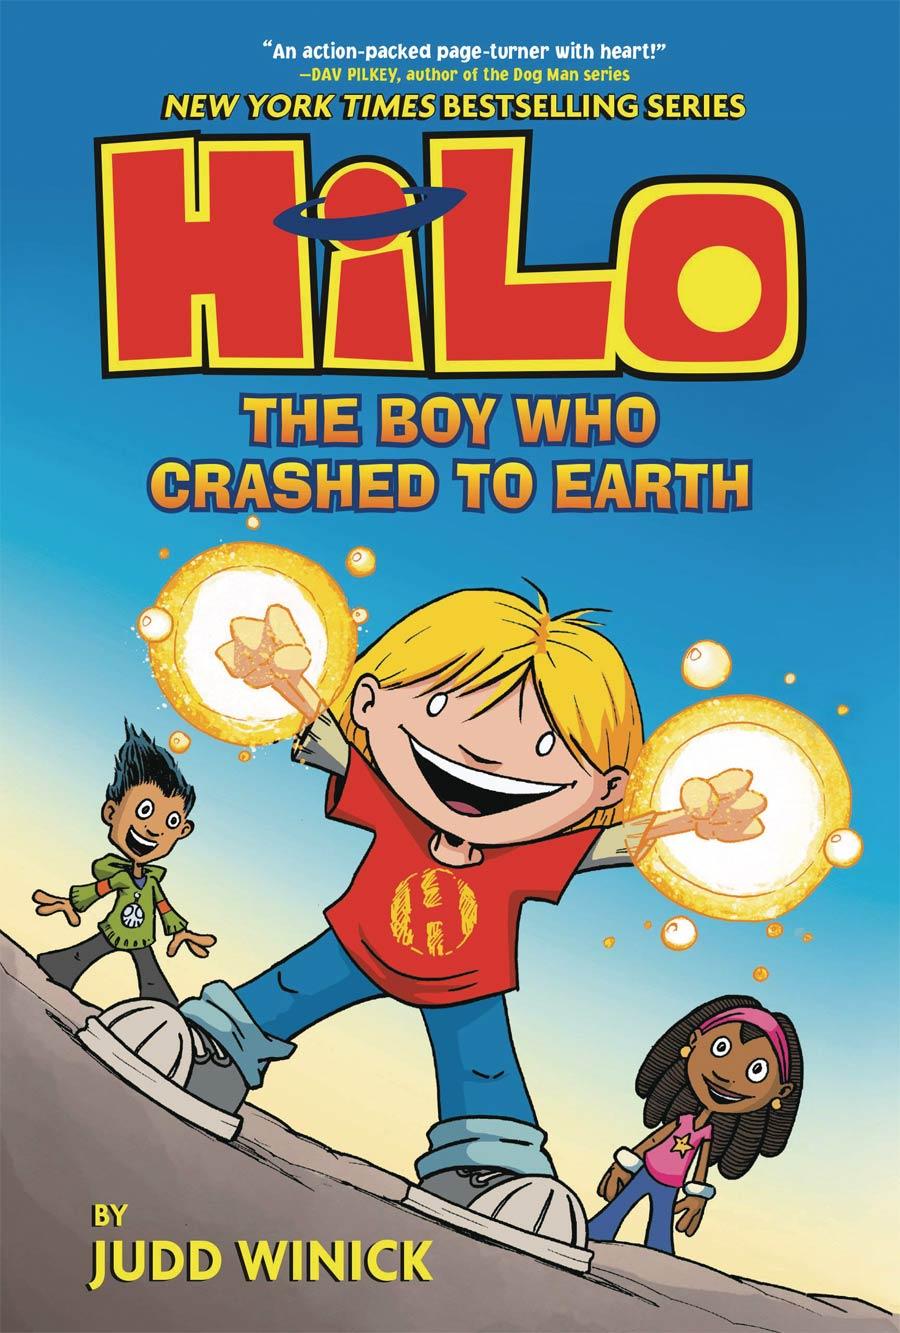 Hilo Vol 1 Boy Who Crashed To Earth TP